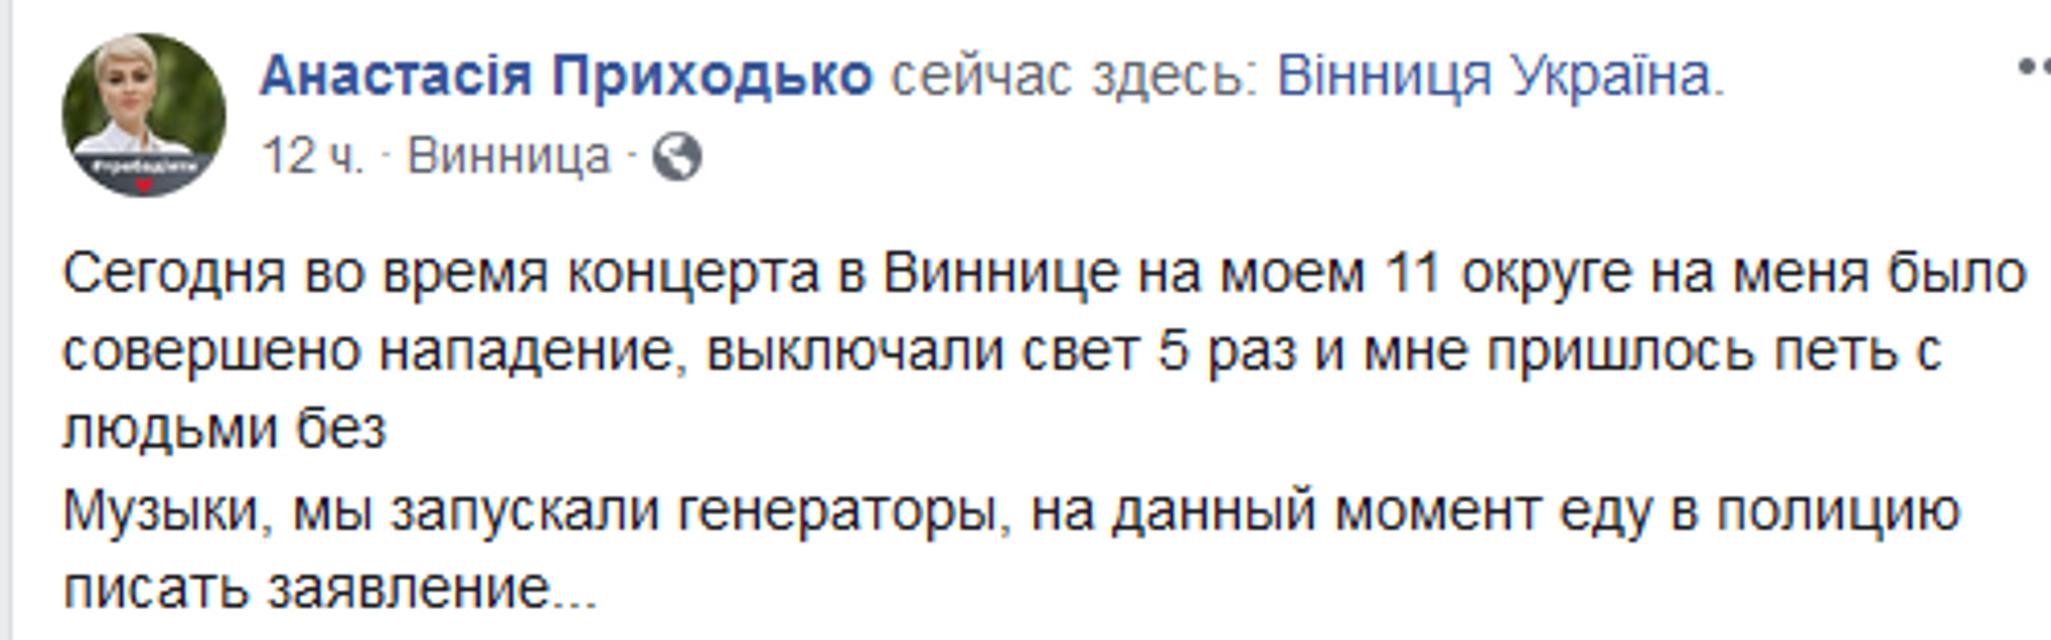 В Виннице 'напали' на Анастасию Приходько – ФОТО, ВИДЕО - фото 184560